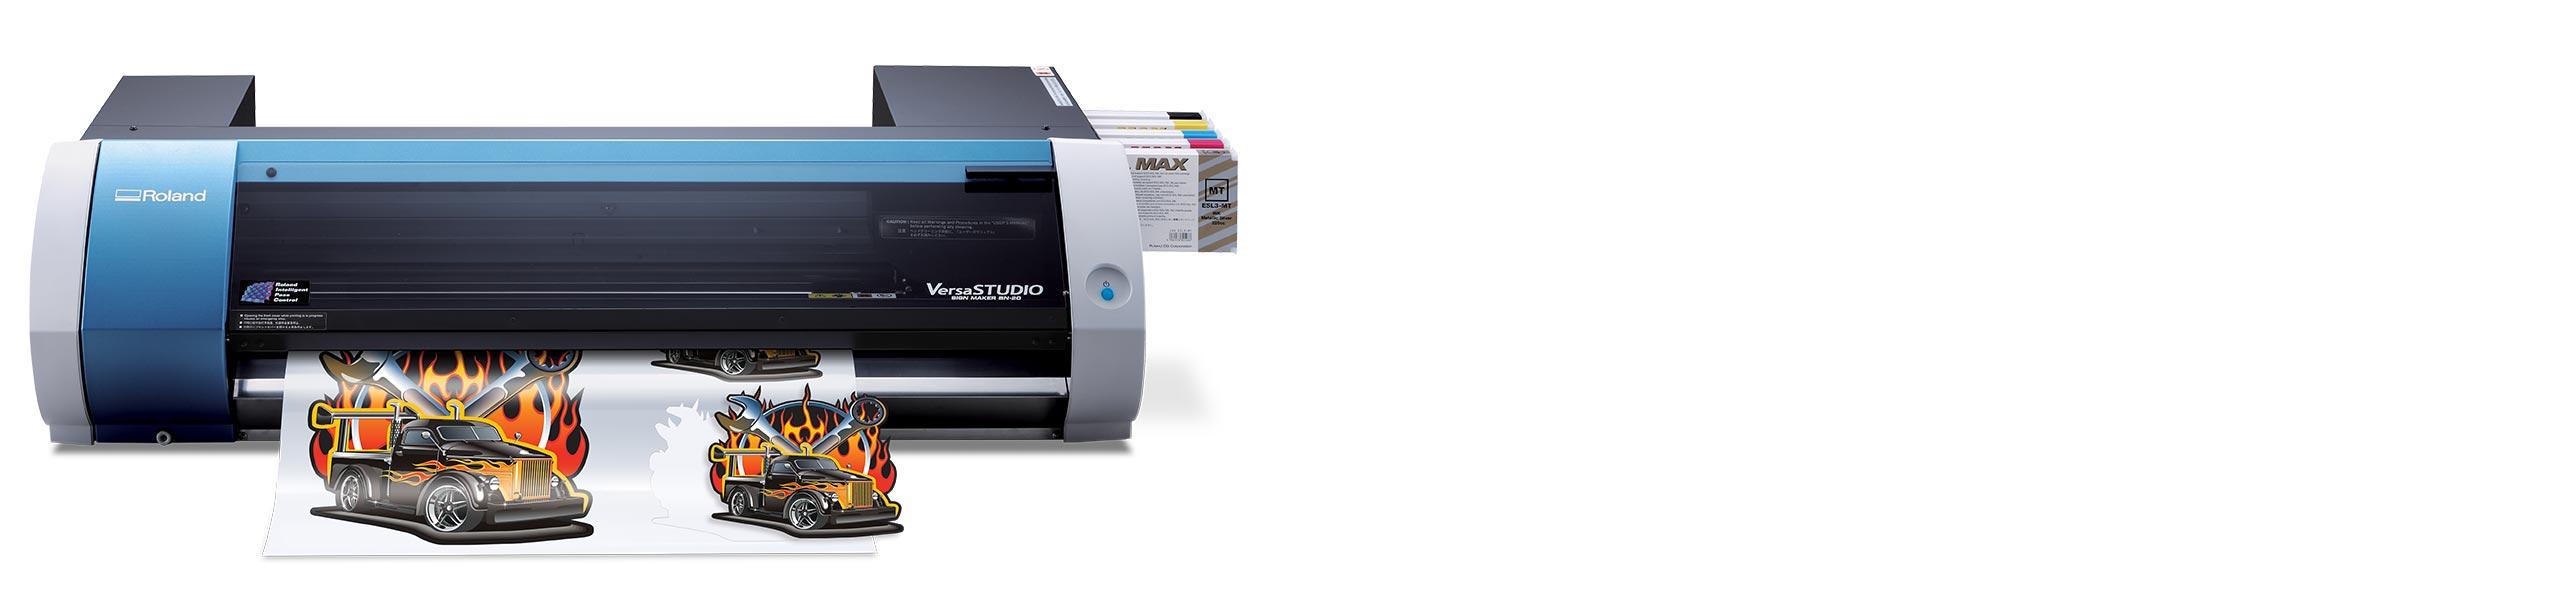 0f9781f2f6bb VersaSTUDIO BN-20 - drukarka przenośna do etykiet i naklejek